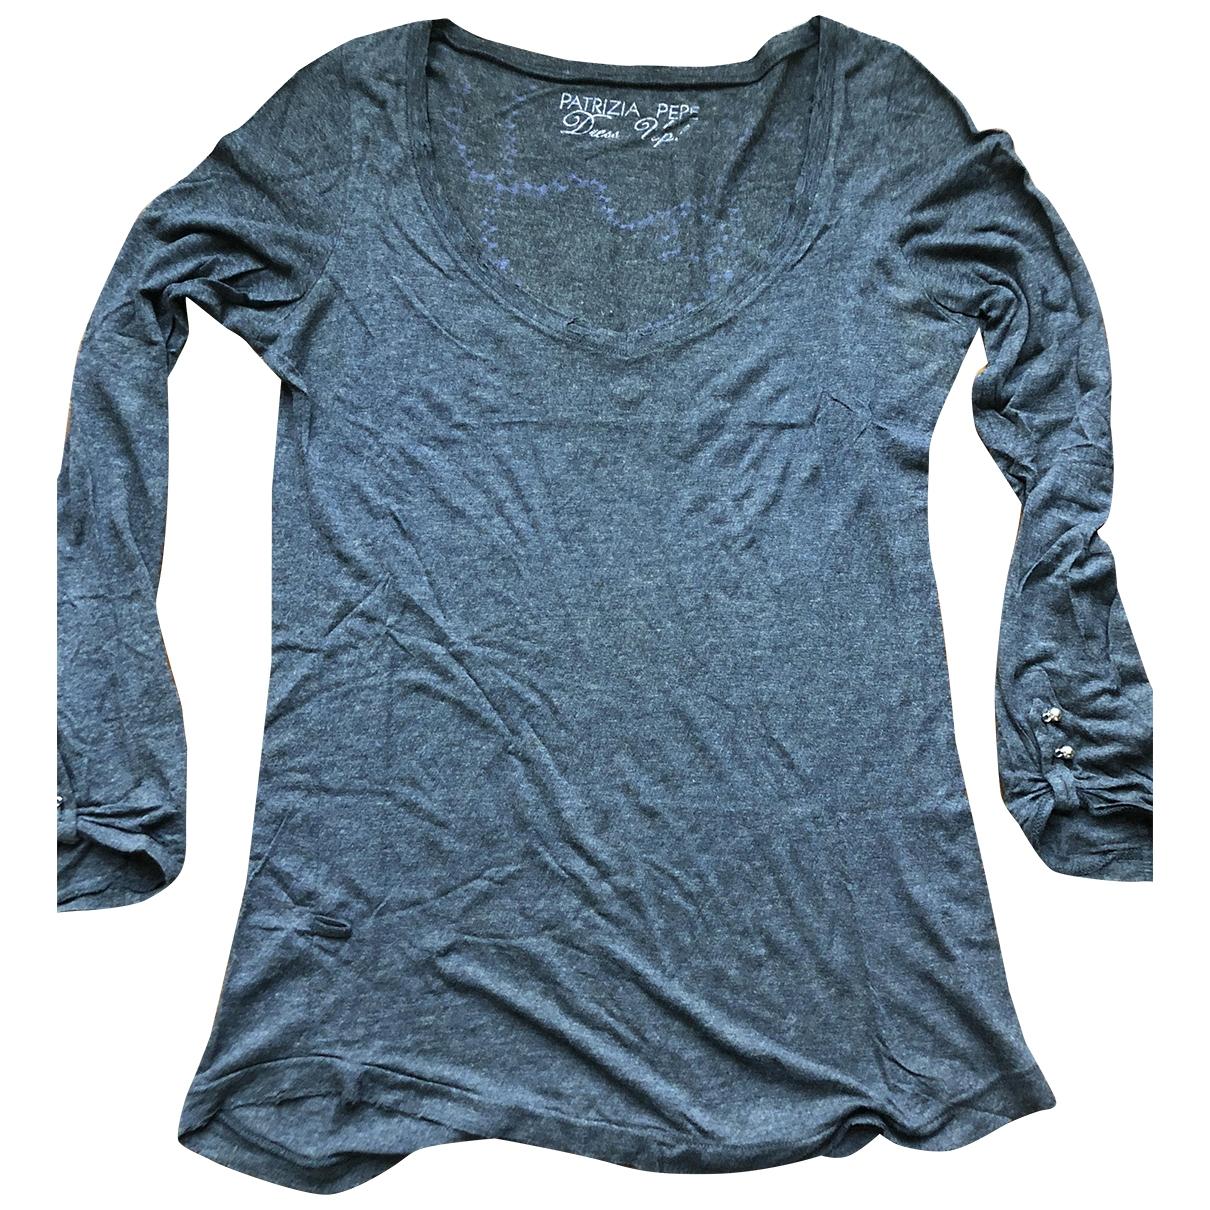 Patrizia Pepe \N Blue  top for Women 40 IT